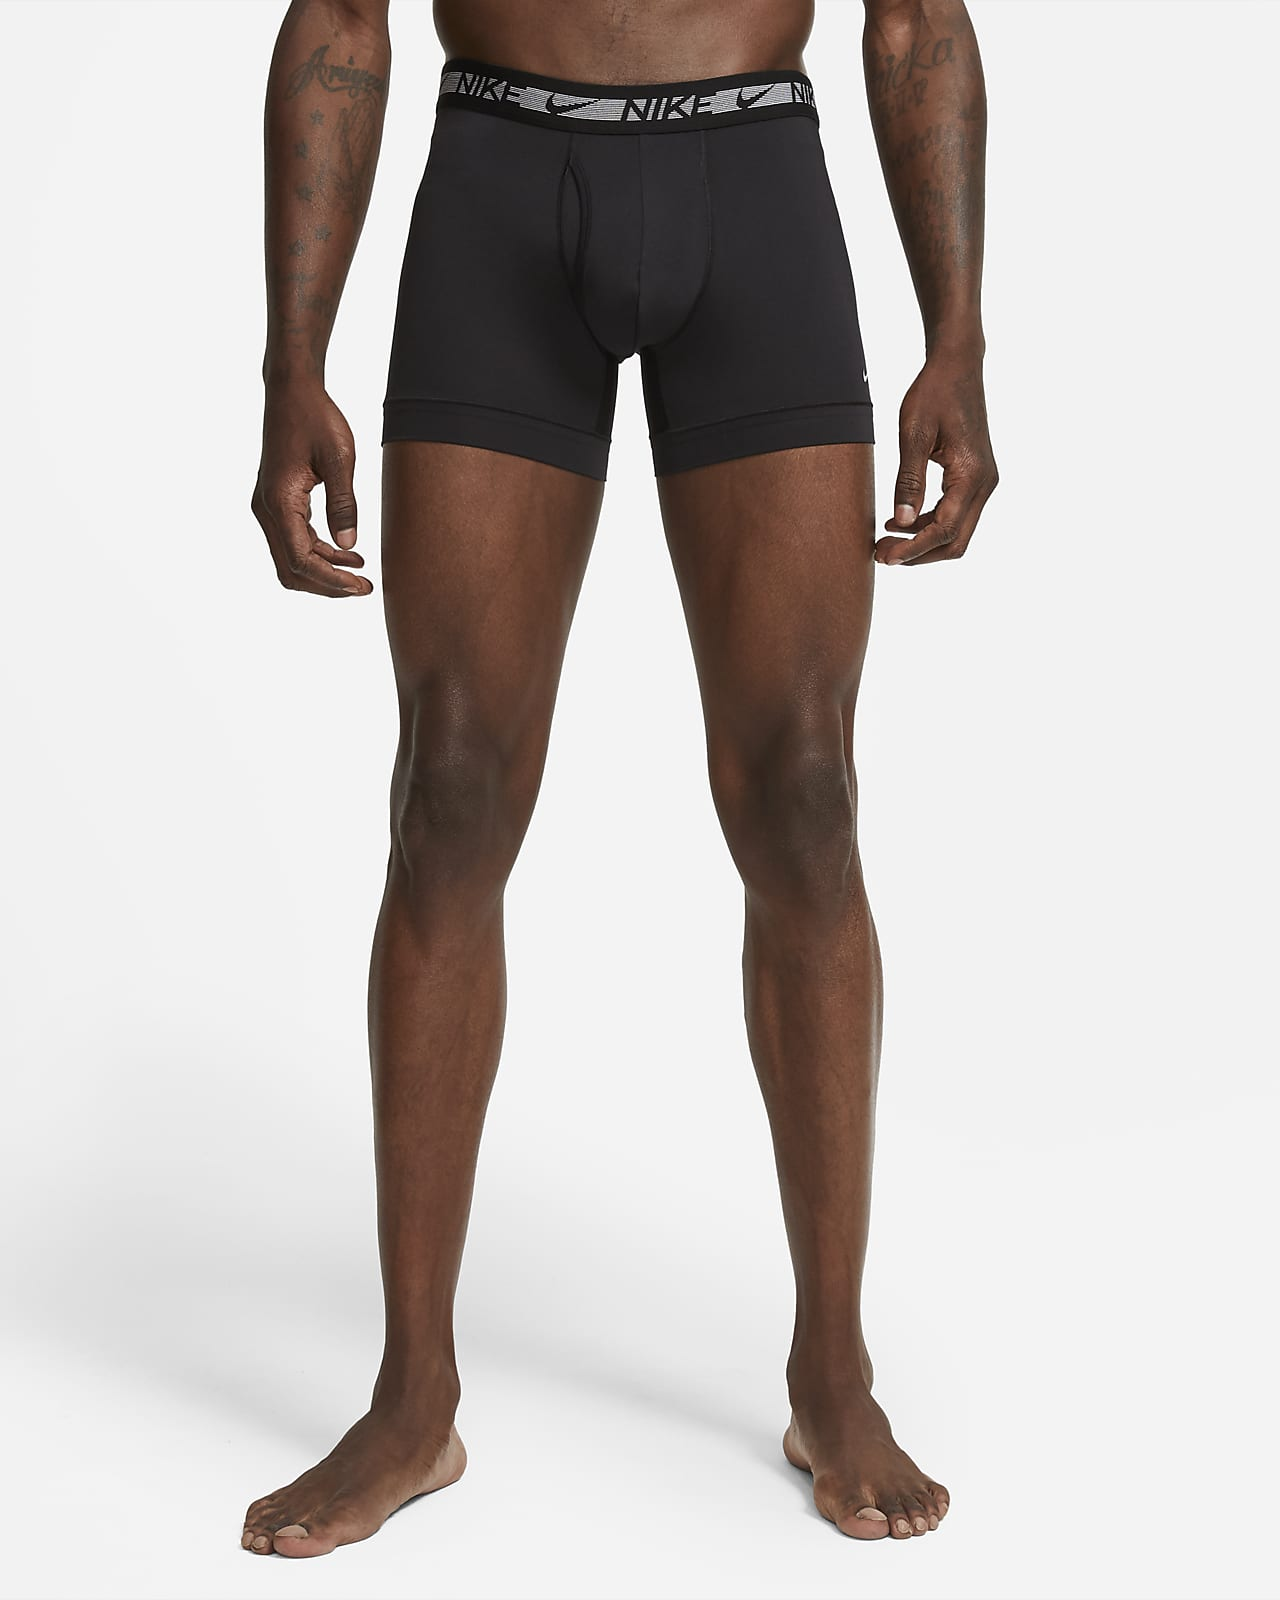 Secretar lote fusión  Bañador para hombre Nike Flex Micro (paquete de tres). Nike.com